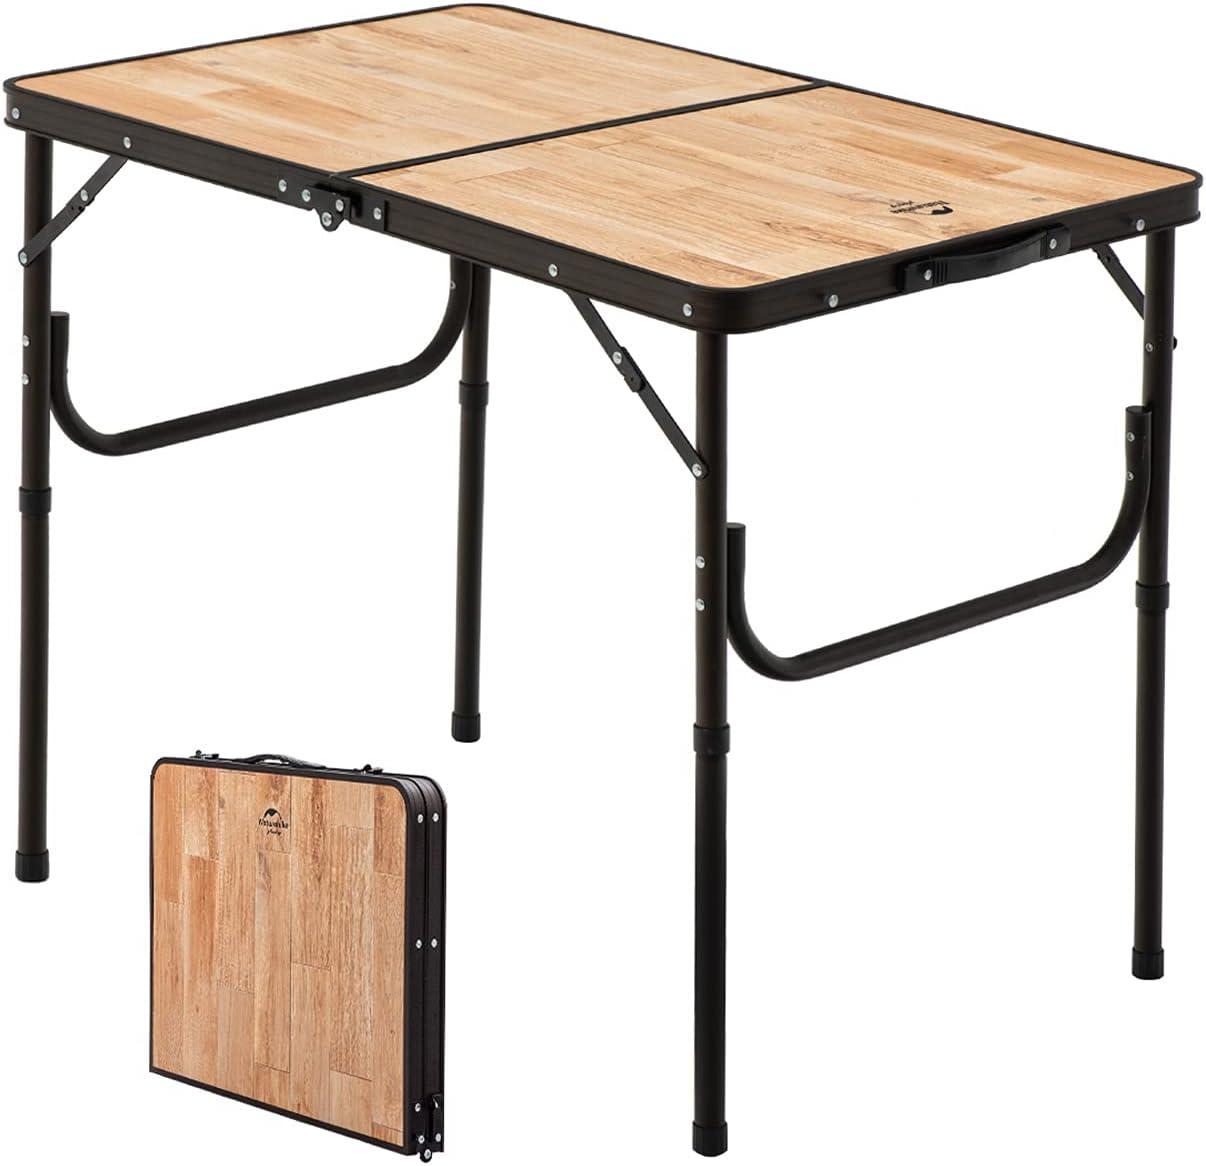 Naturehike Folding Table Portable Height Lig Adjustable Super-cheap Aluminum Max 71% OFF